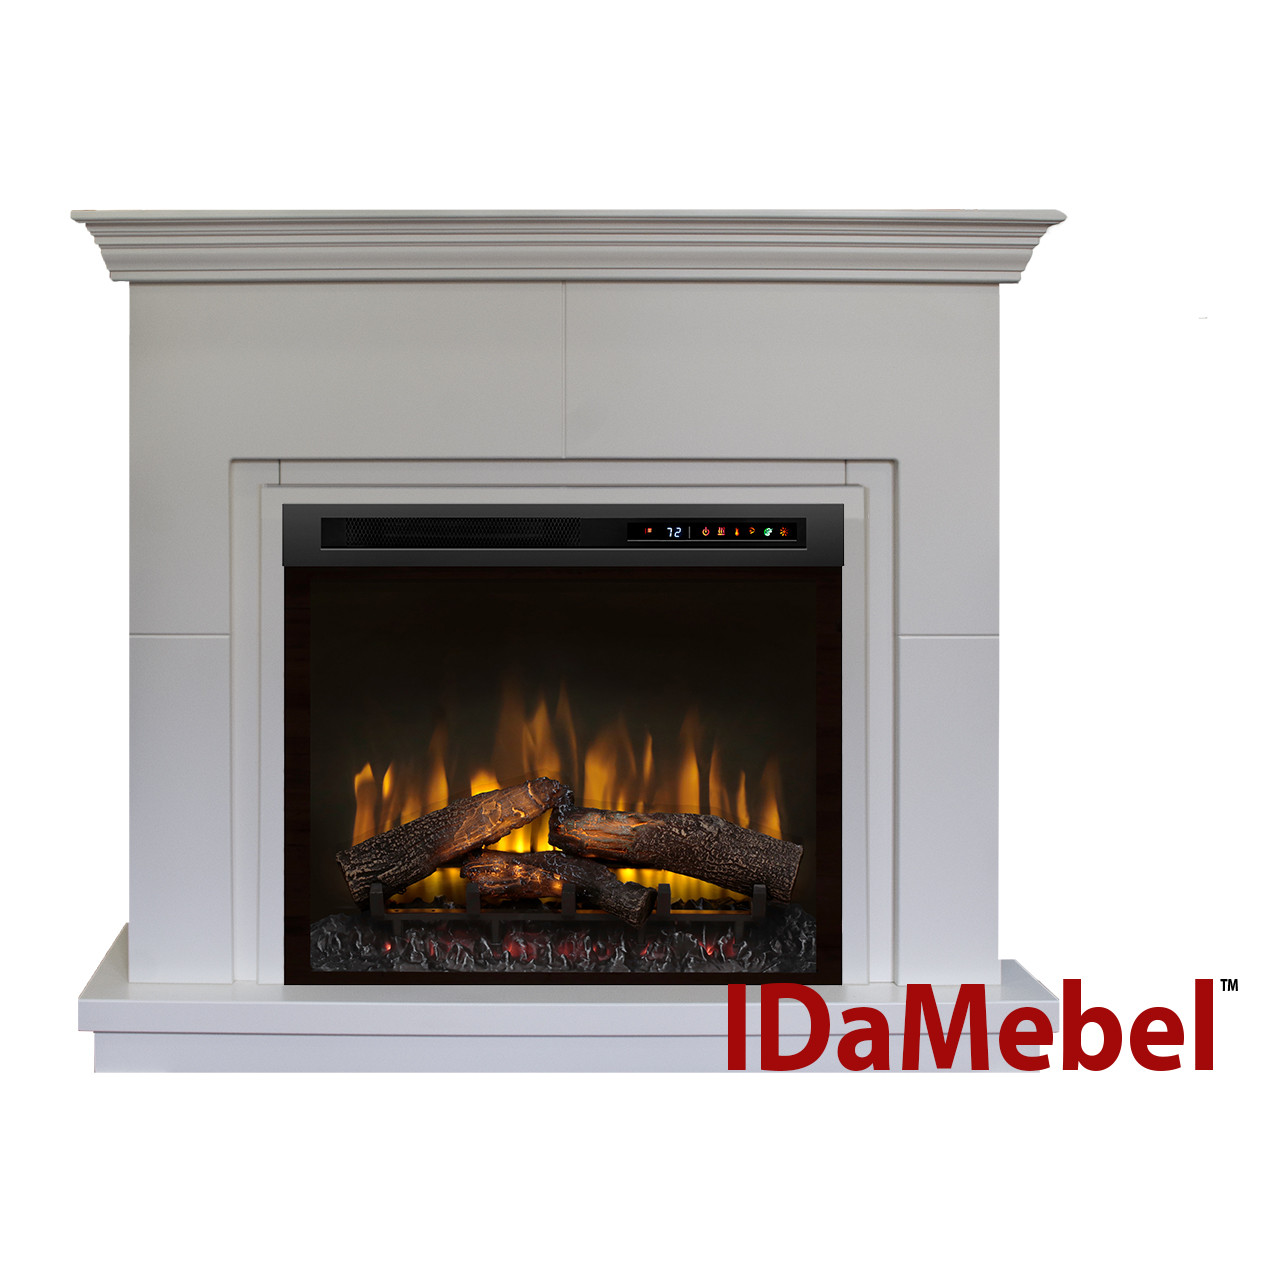 Каминокомплект IDaMebel Montreal XHD28L-INT Белый